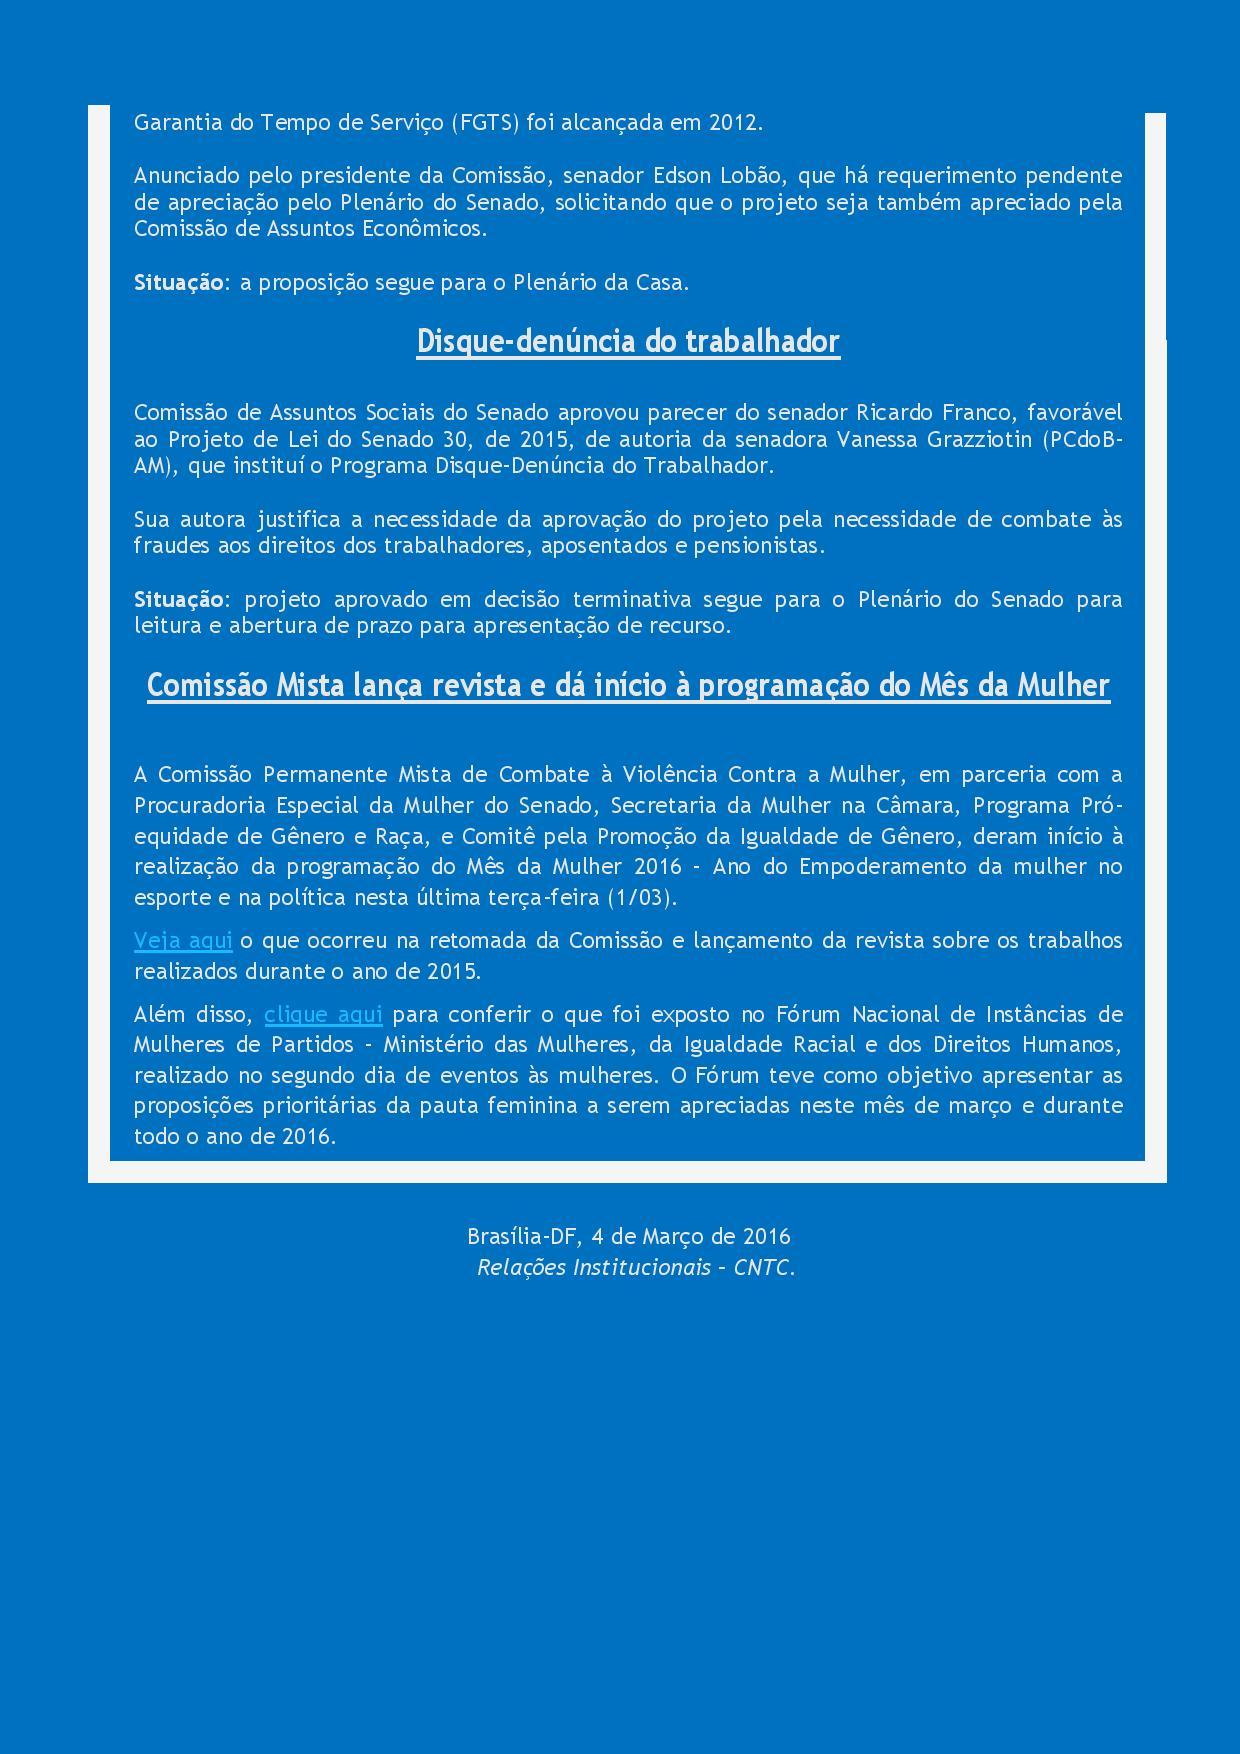 Newslatter Legislativo - 1 a 3 de março-page-002